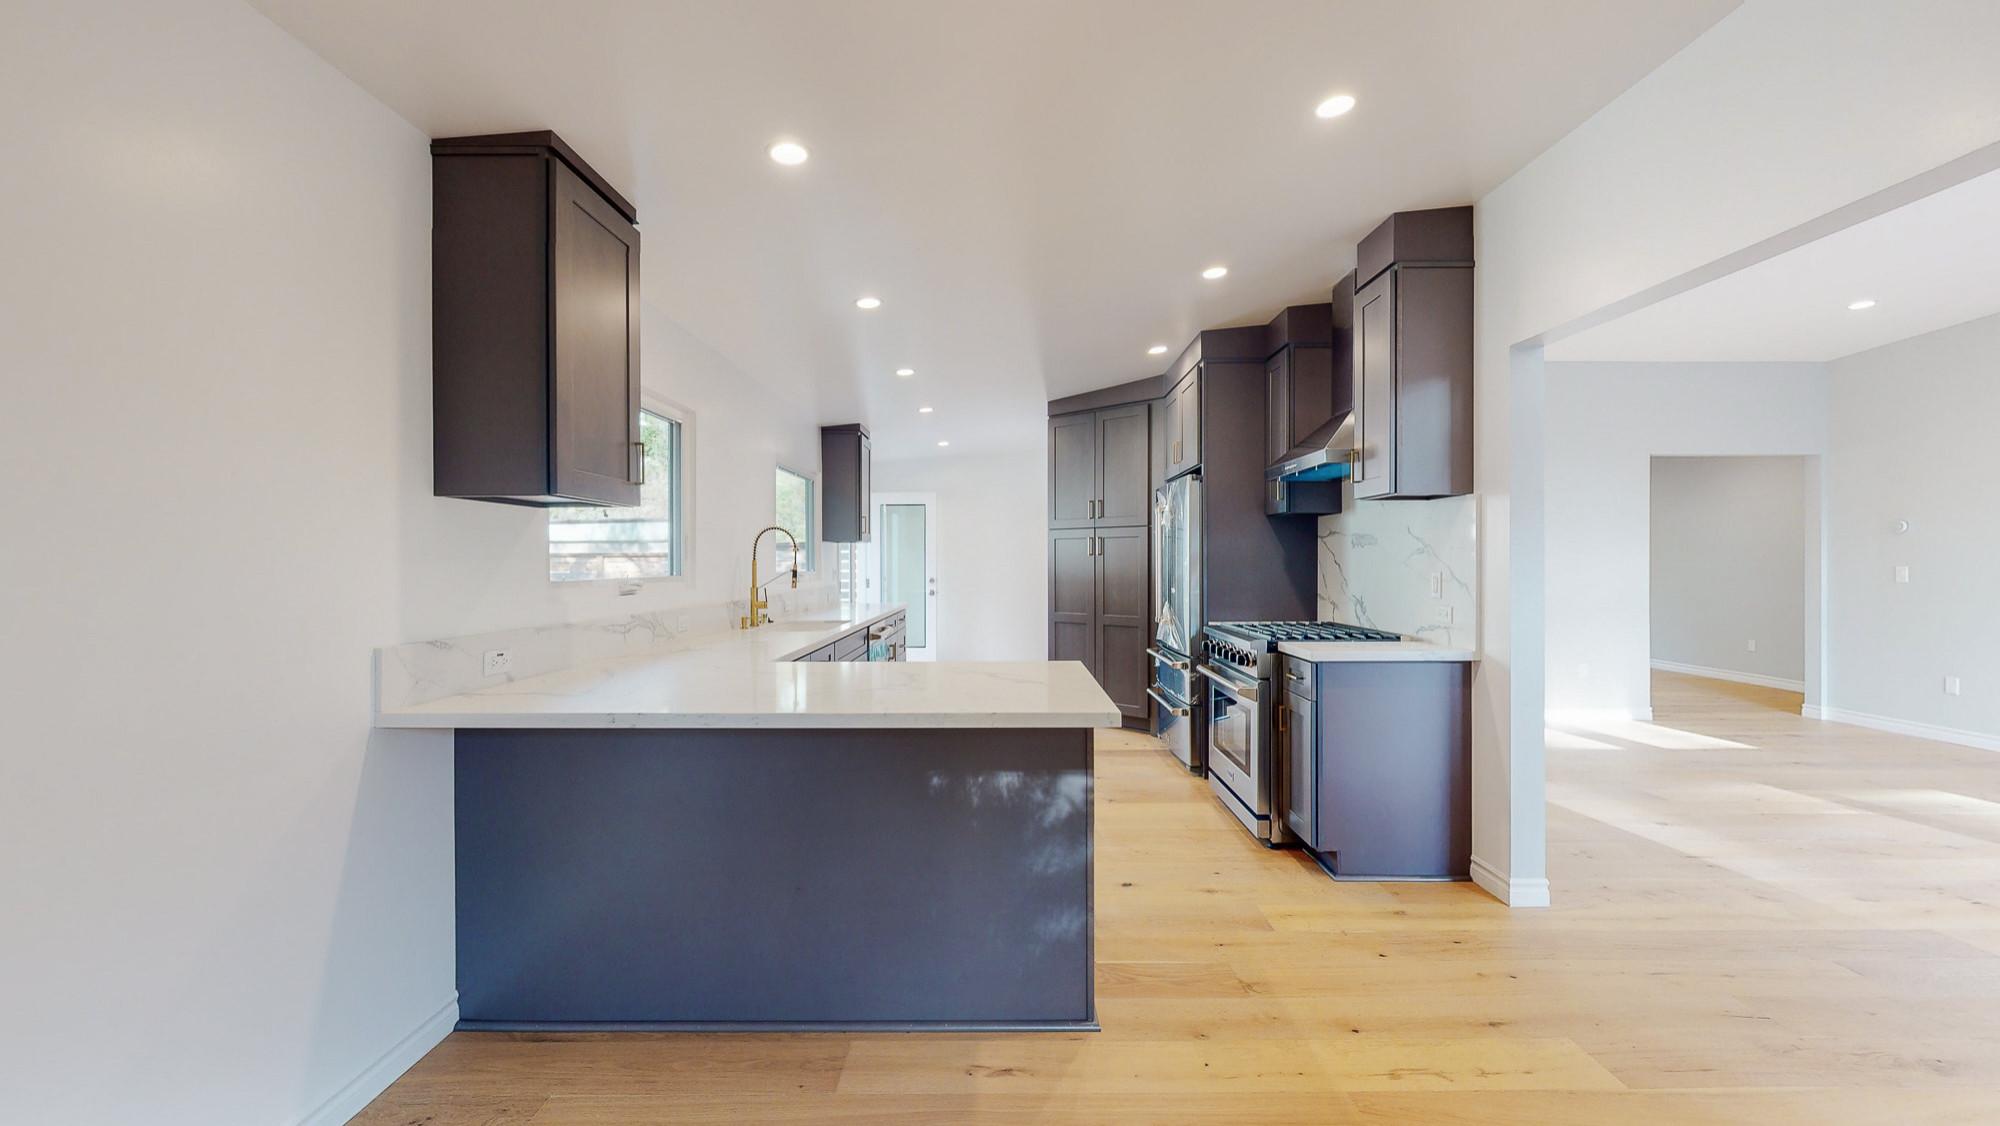 Full Interior Remodel Kitchen